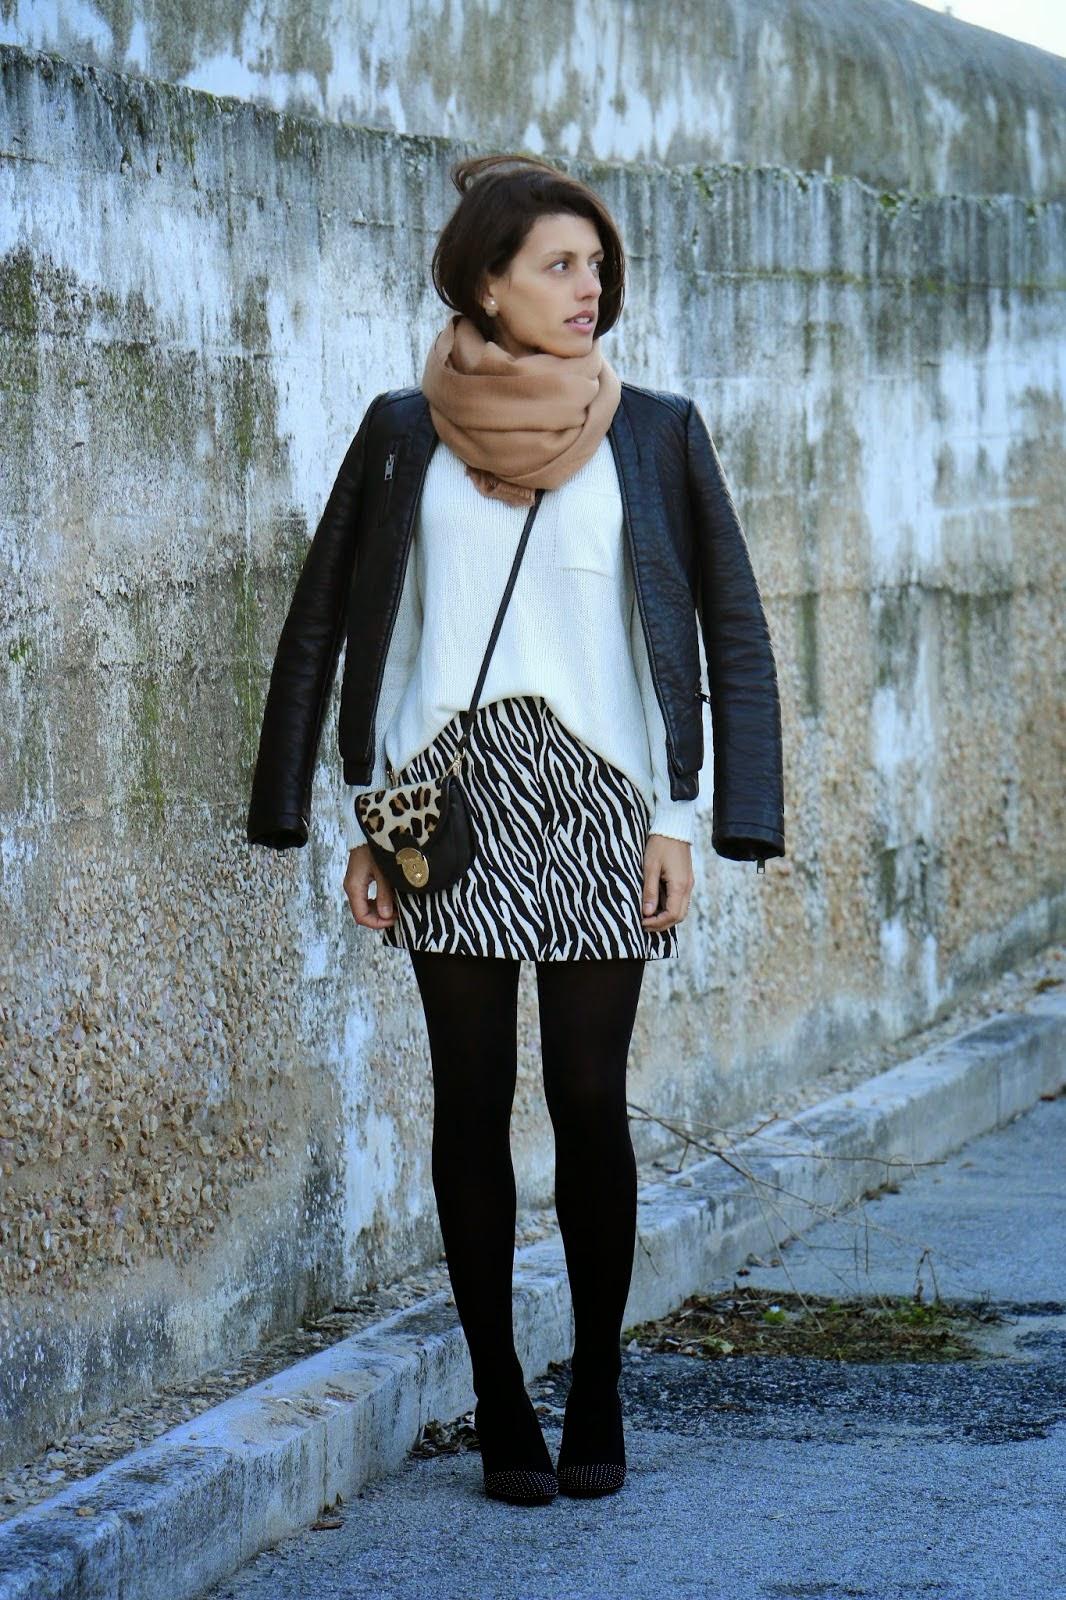 http://ilovefitametrica.blogspot.pt/2014/12/zebra-vs-leo.html